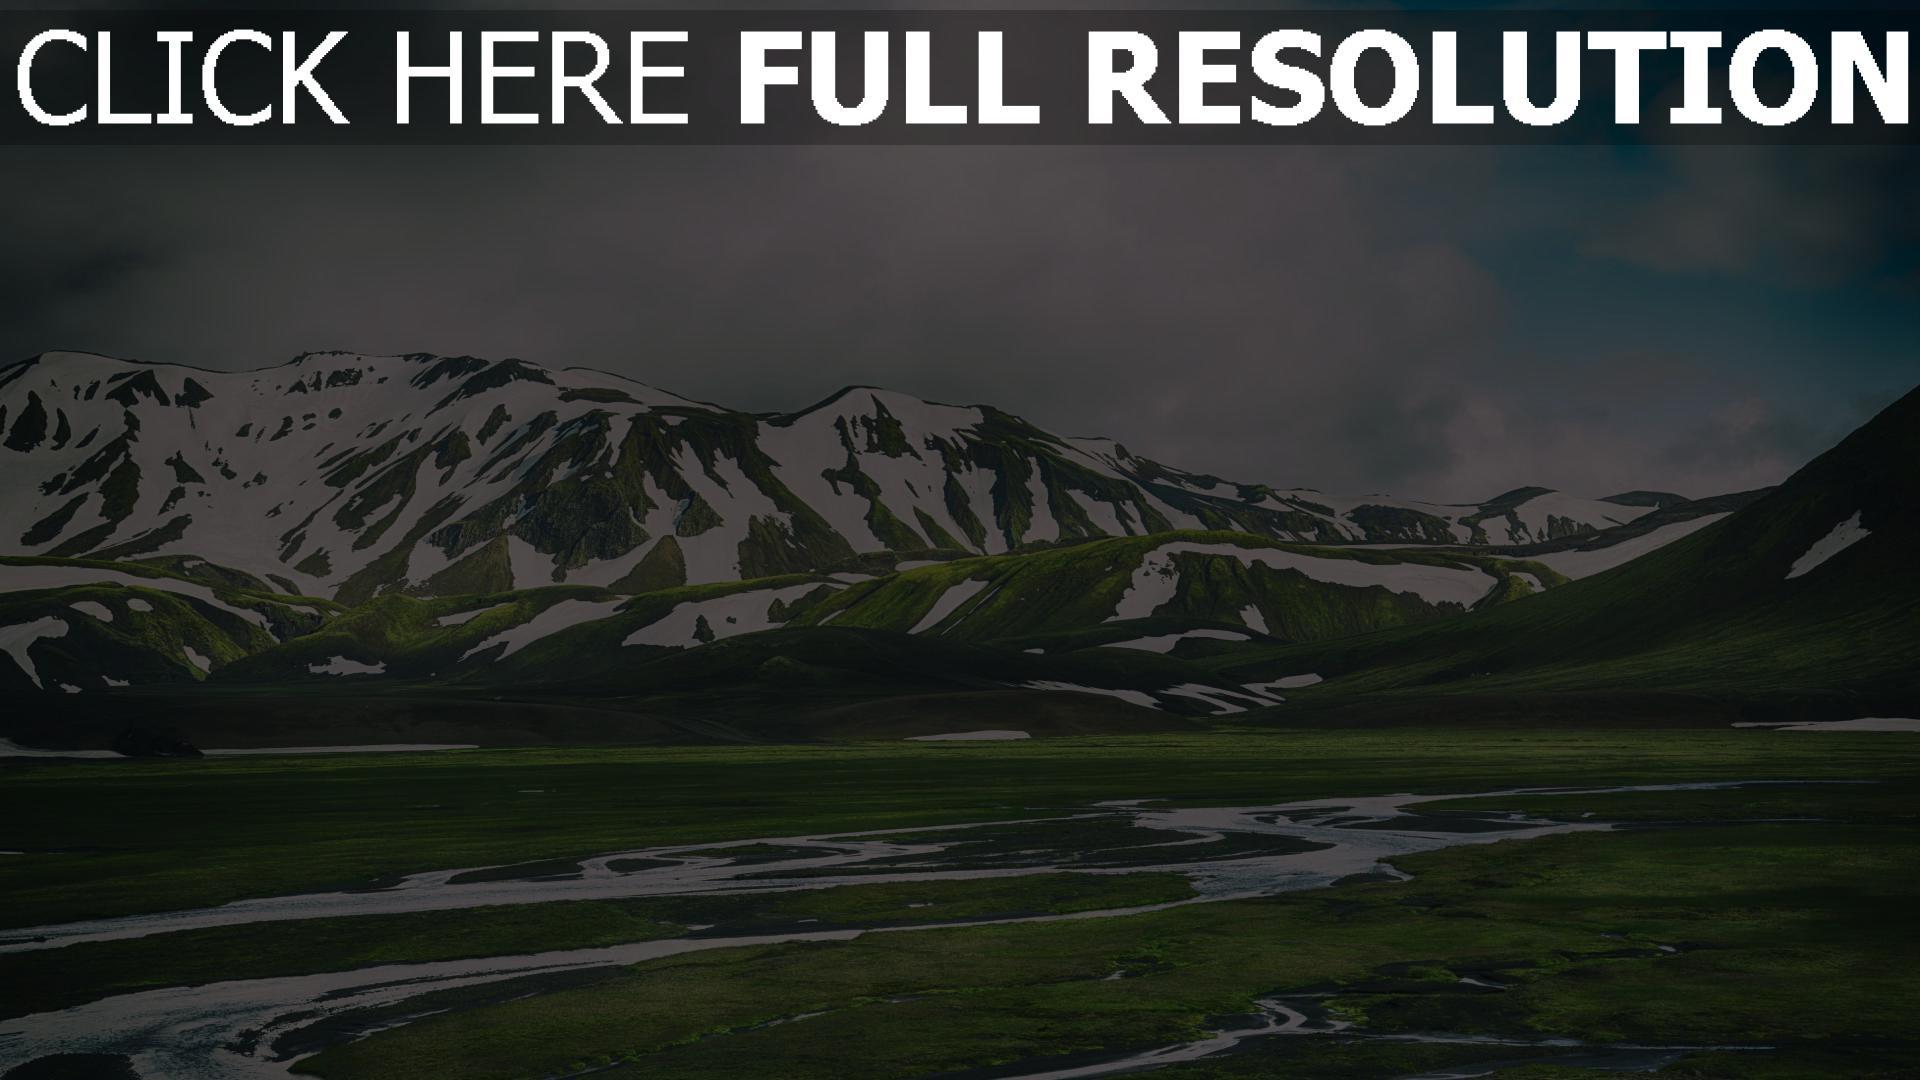 hd hintergrundbilder berge landmannalaugar island gras 1920x1080